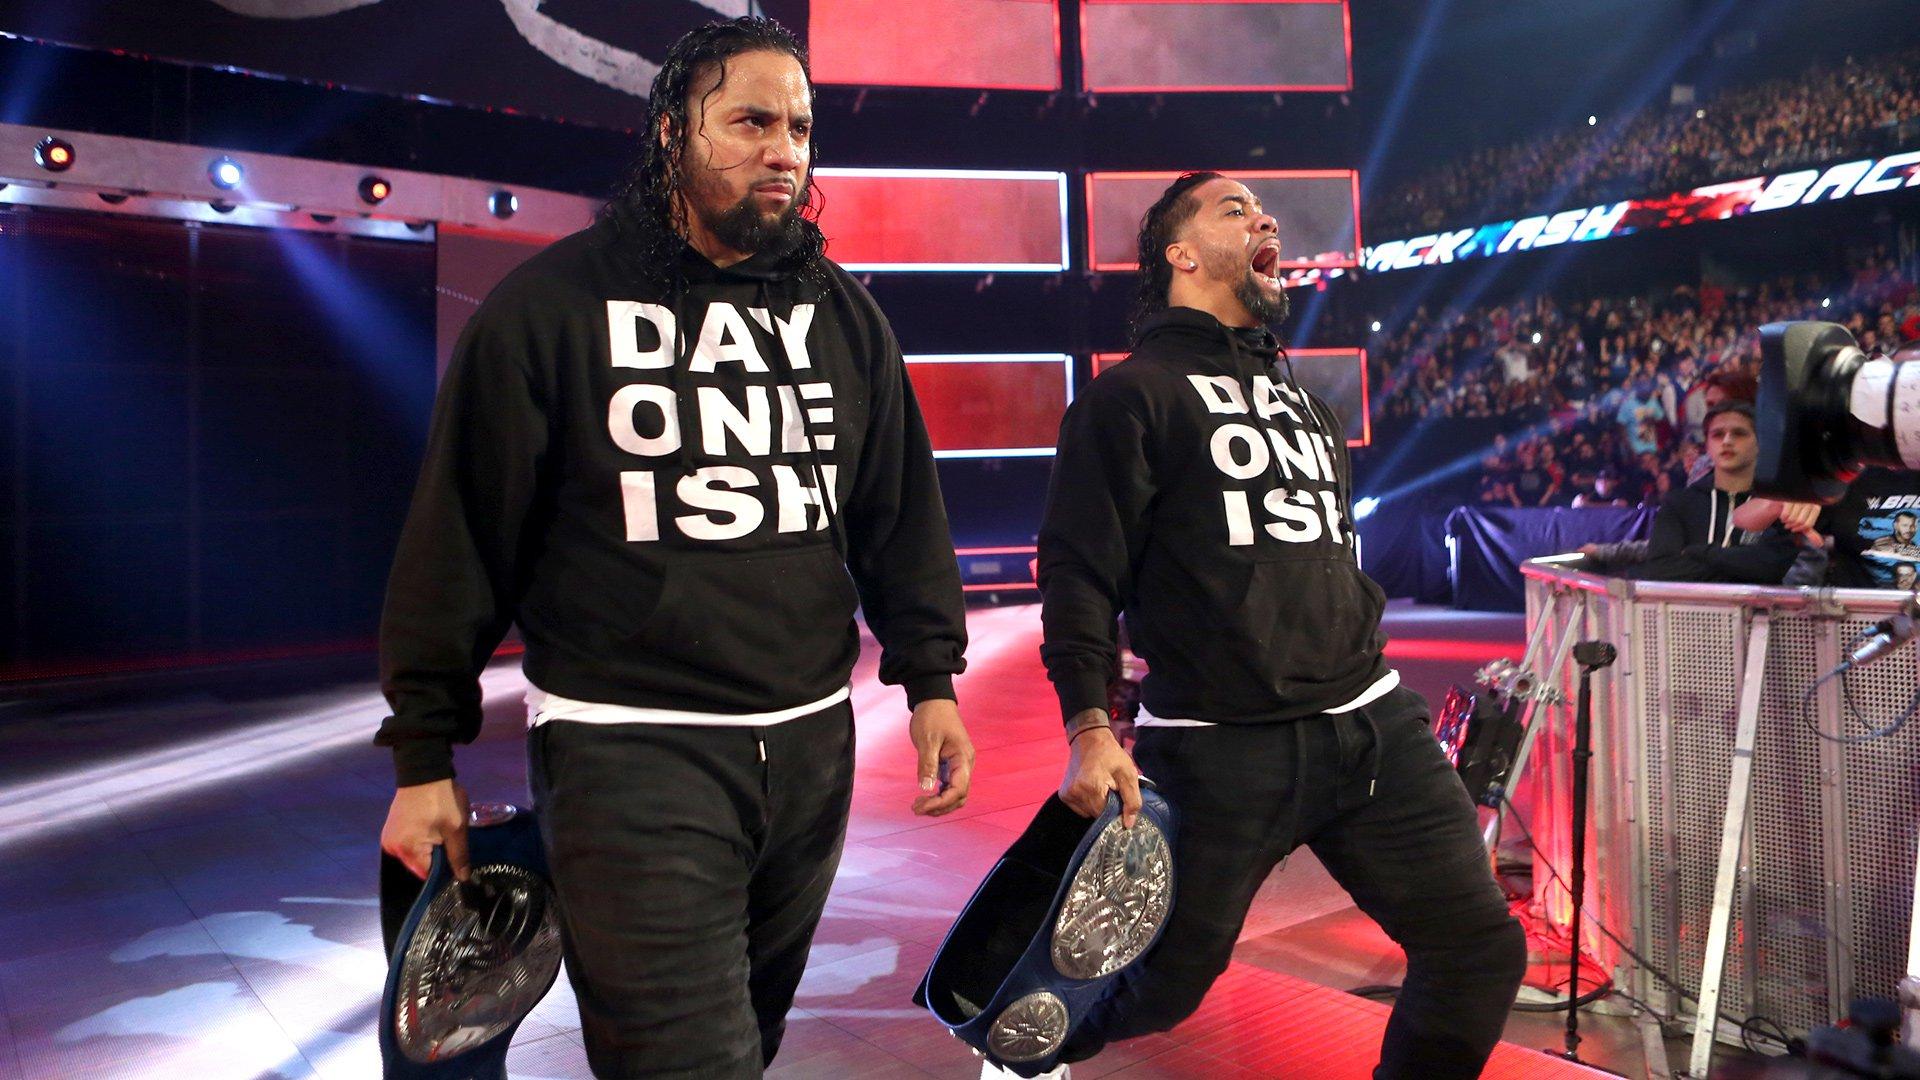 SmackDown Tag Team Champions The Usos won't let Breezango's antics distract them.